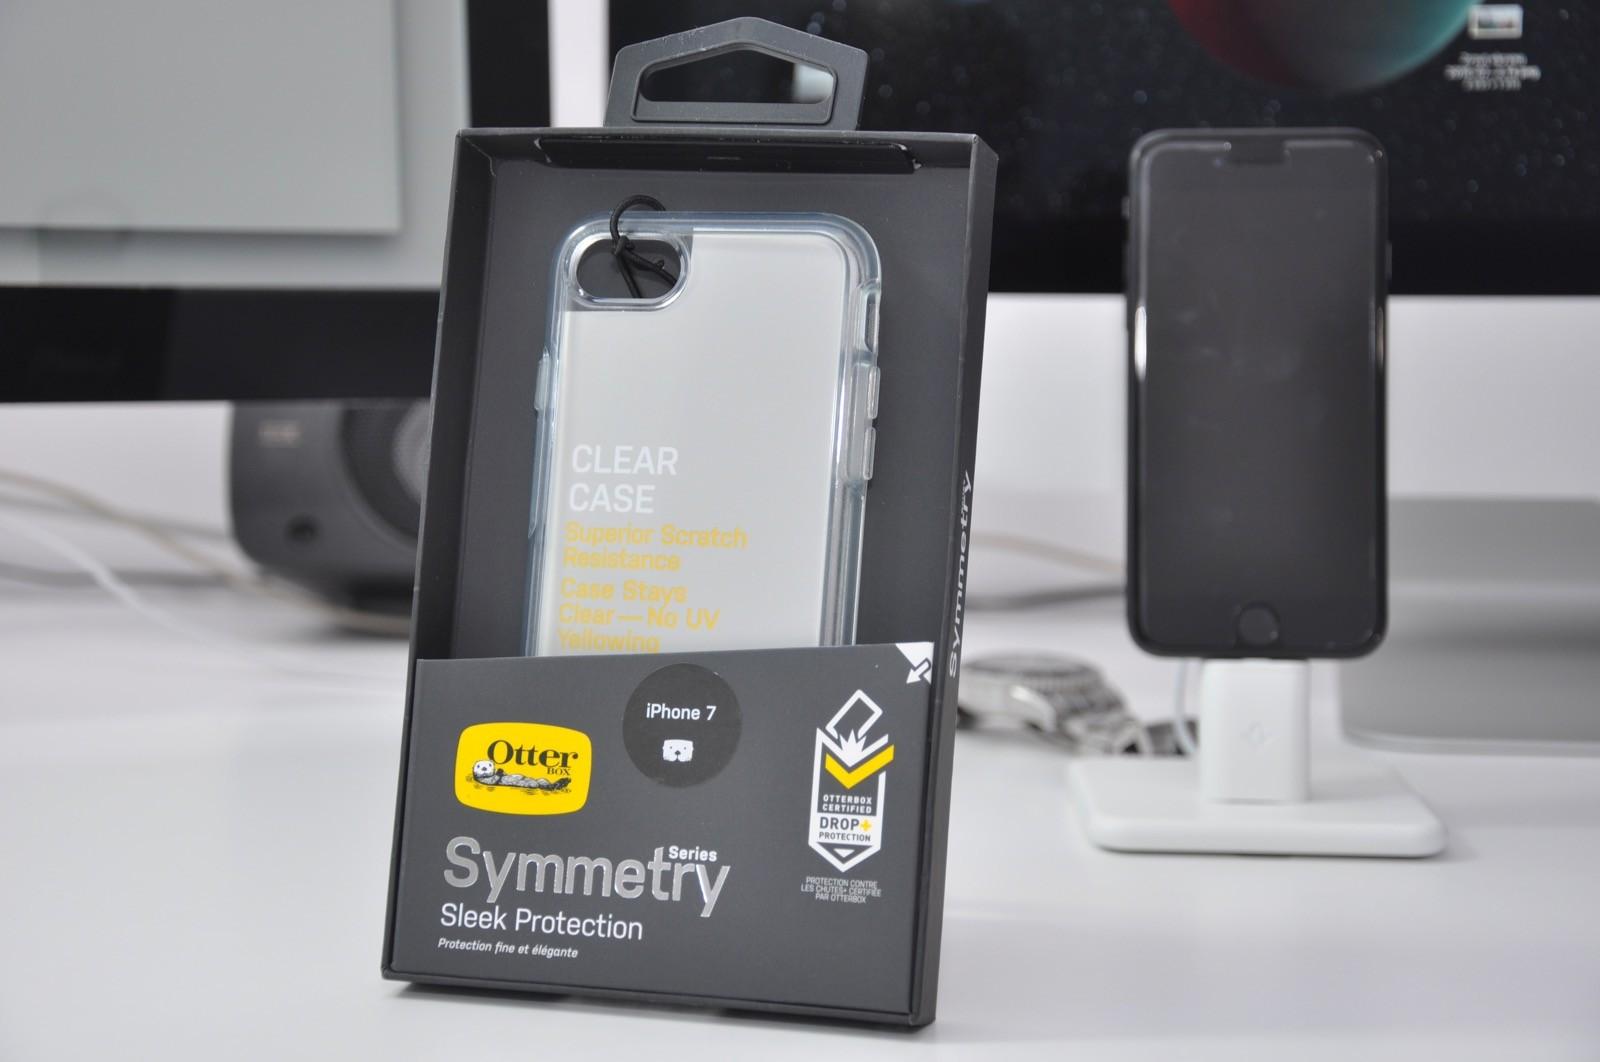 Recenzja etui Otterbox Symmetry Sleek Protection dla iPhone 7